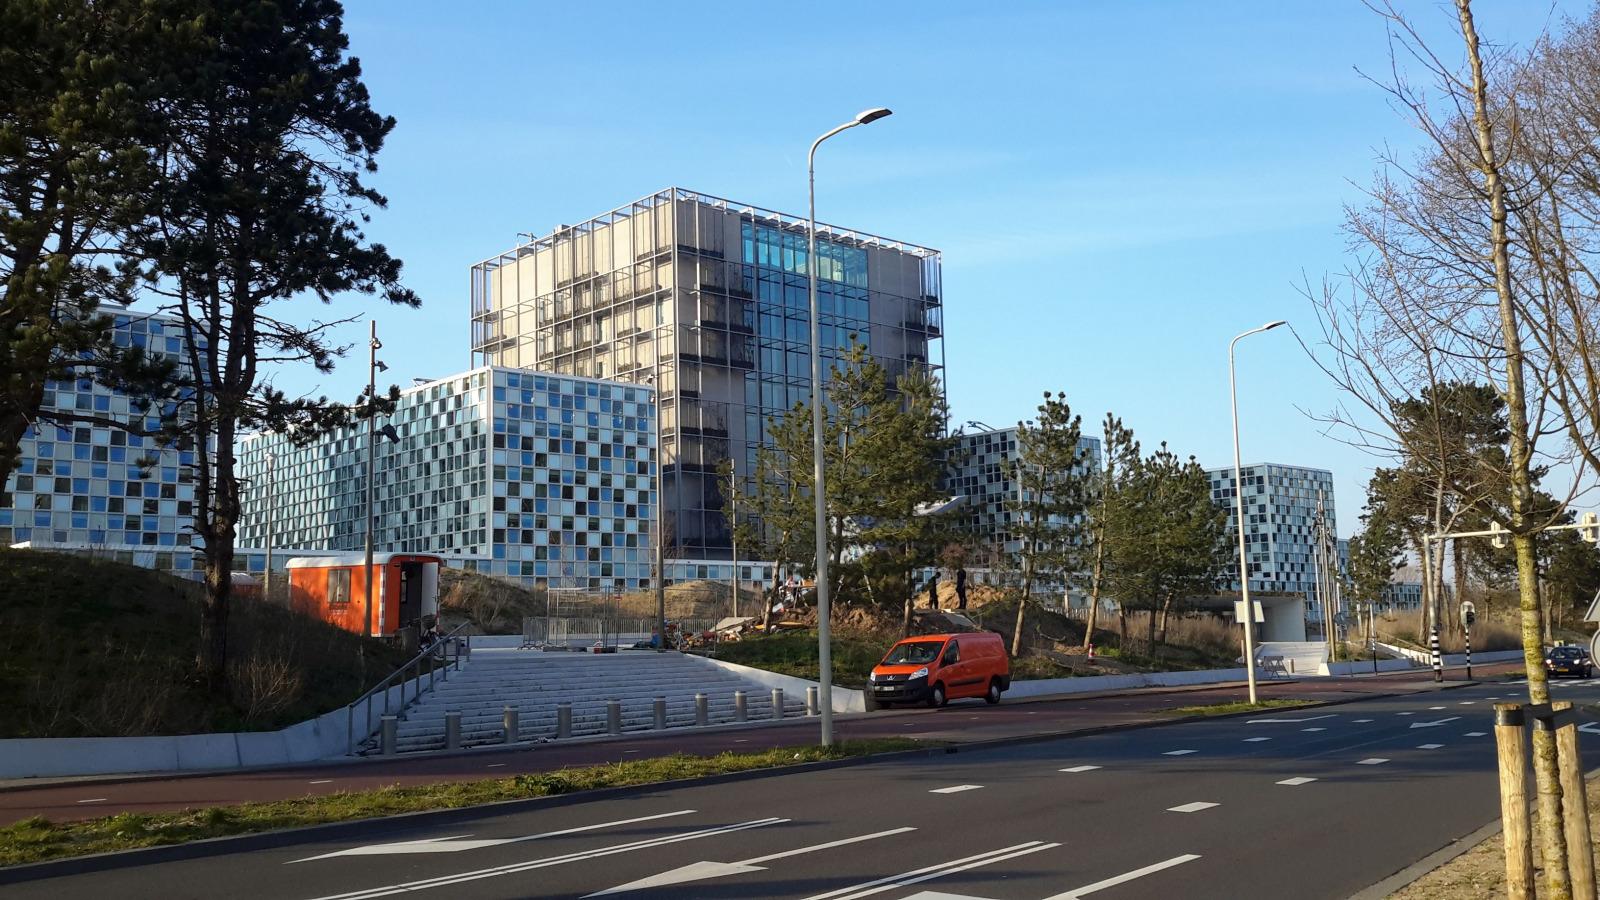 IStGH International Criminal Court Headquarters Netherlands Hypergio wikiccbysa40